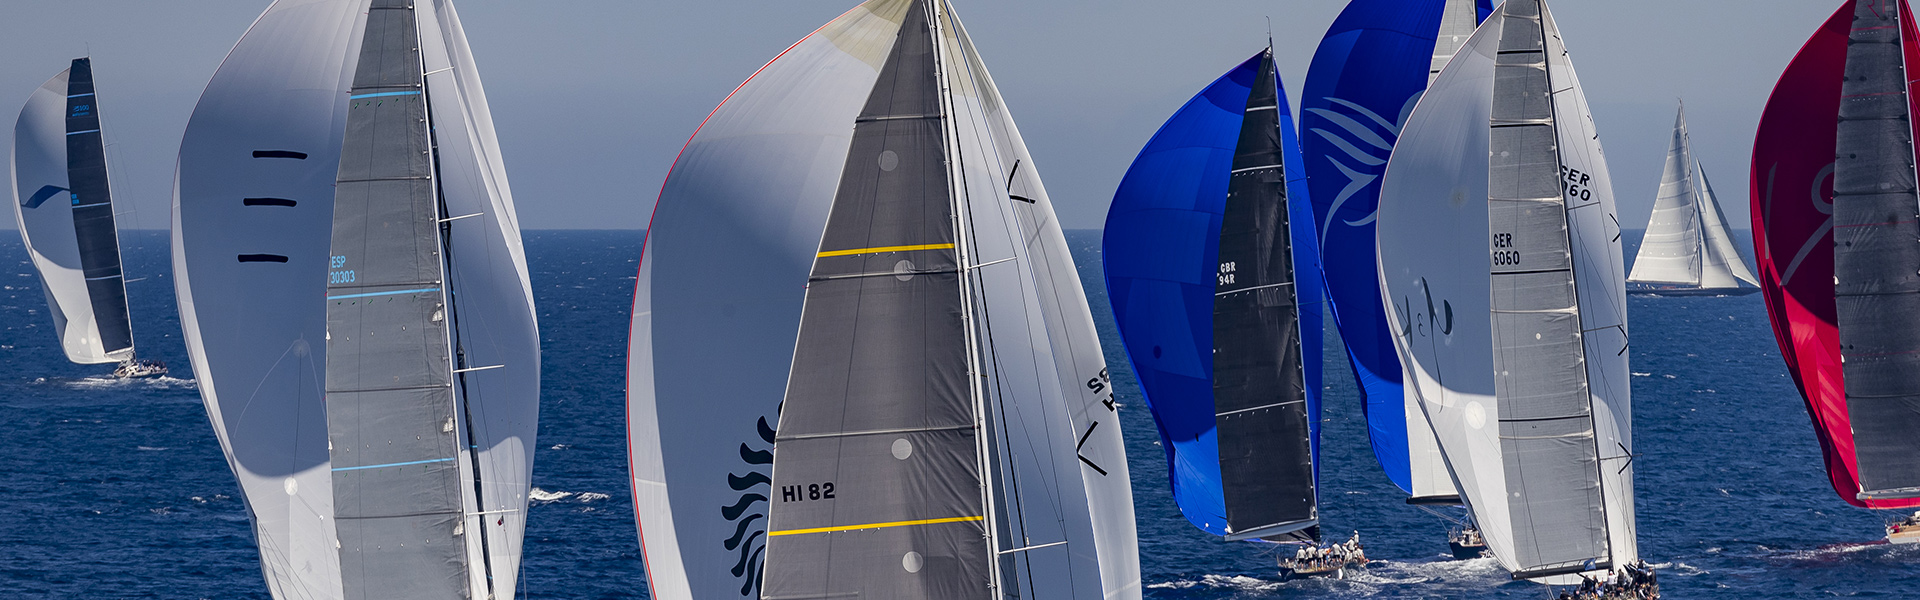 Loro Piana Superyacht Regatta  - Porto Cervo 2021